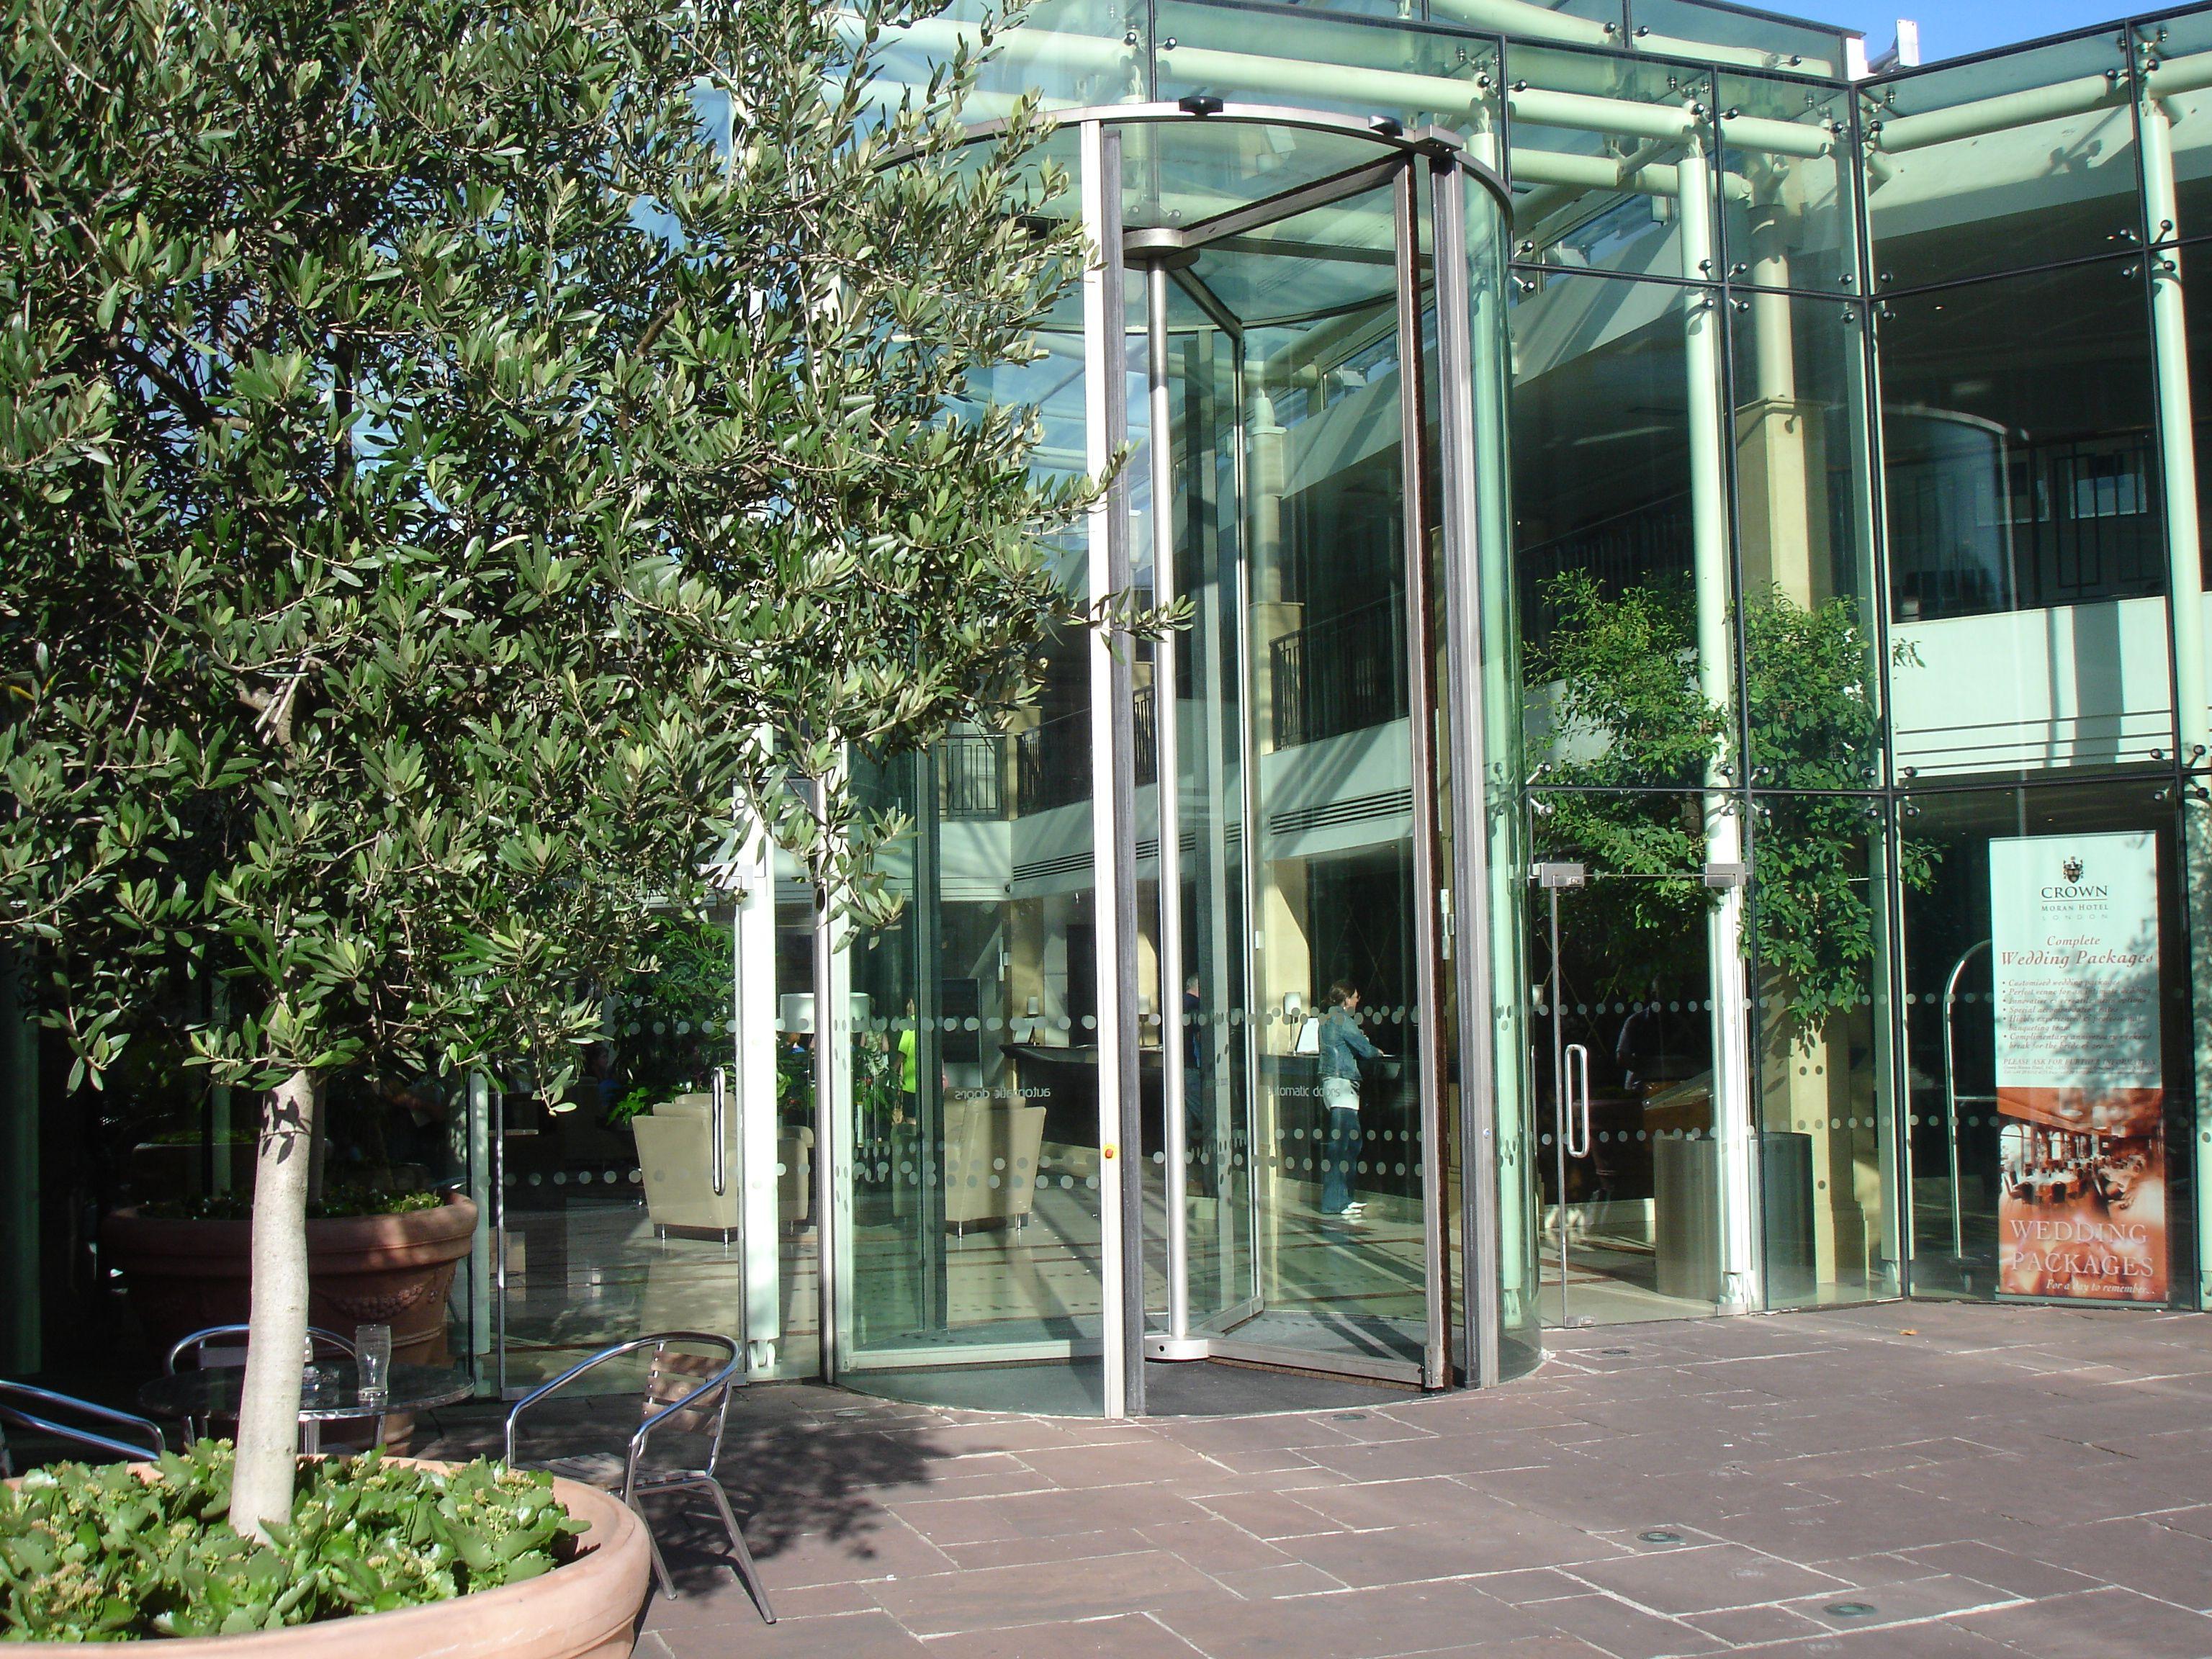 Crown Moran Hotel London. Tall Revolving Door